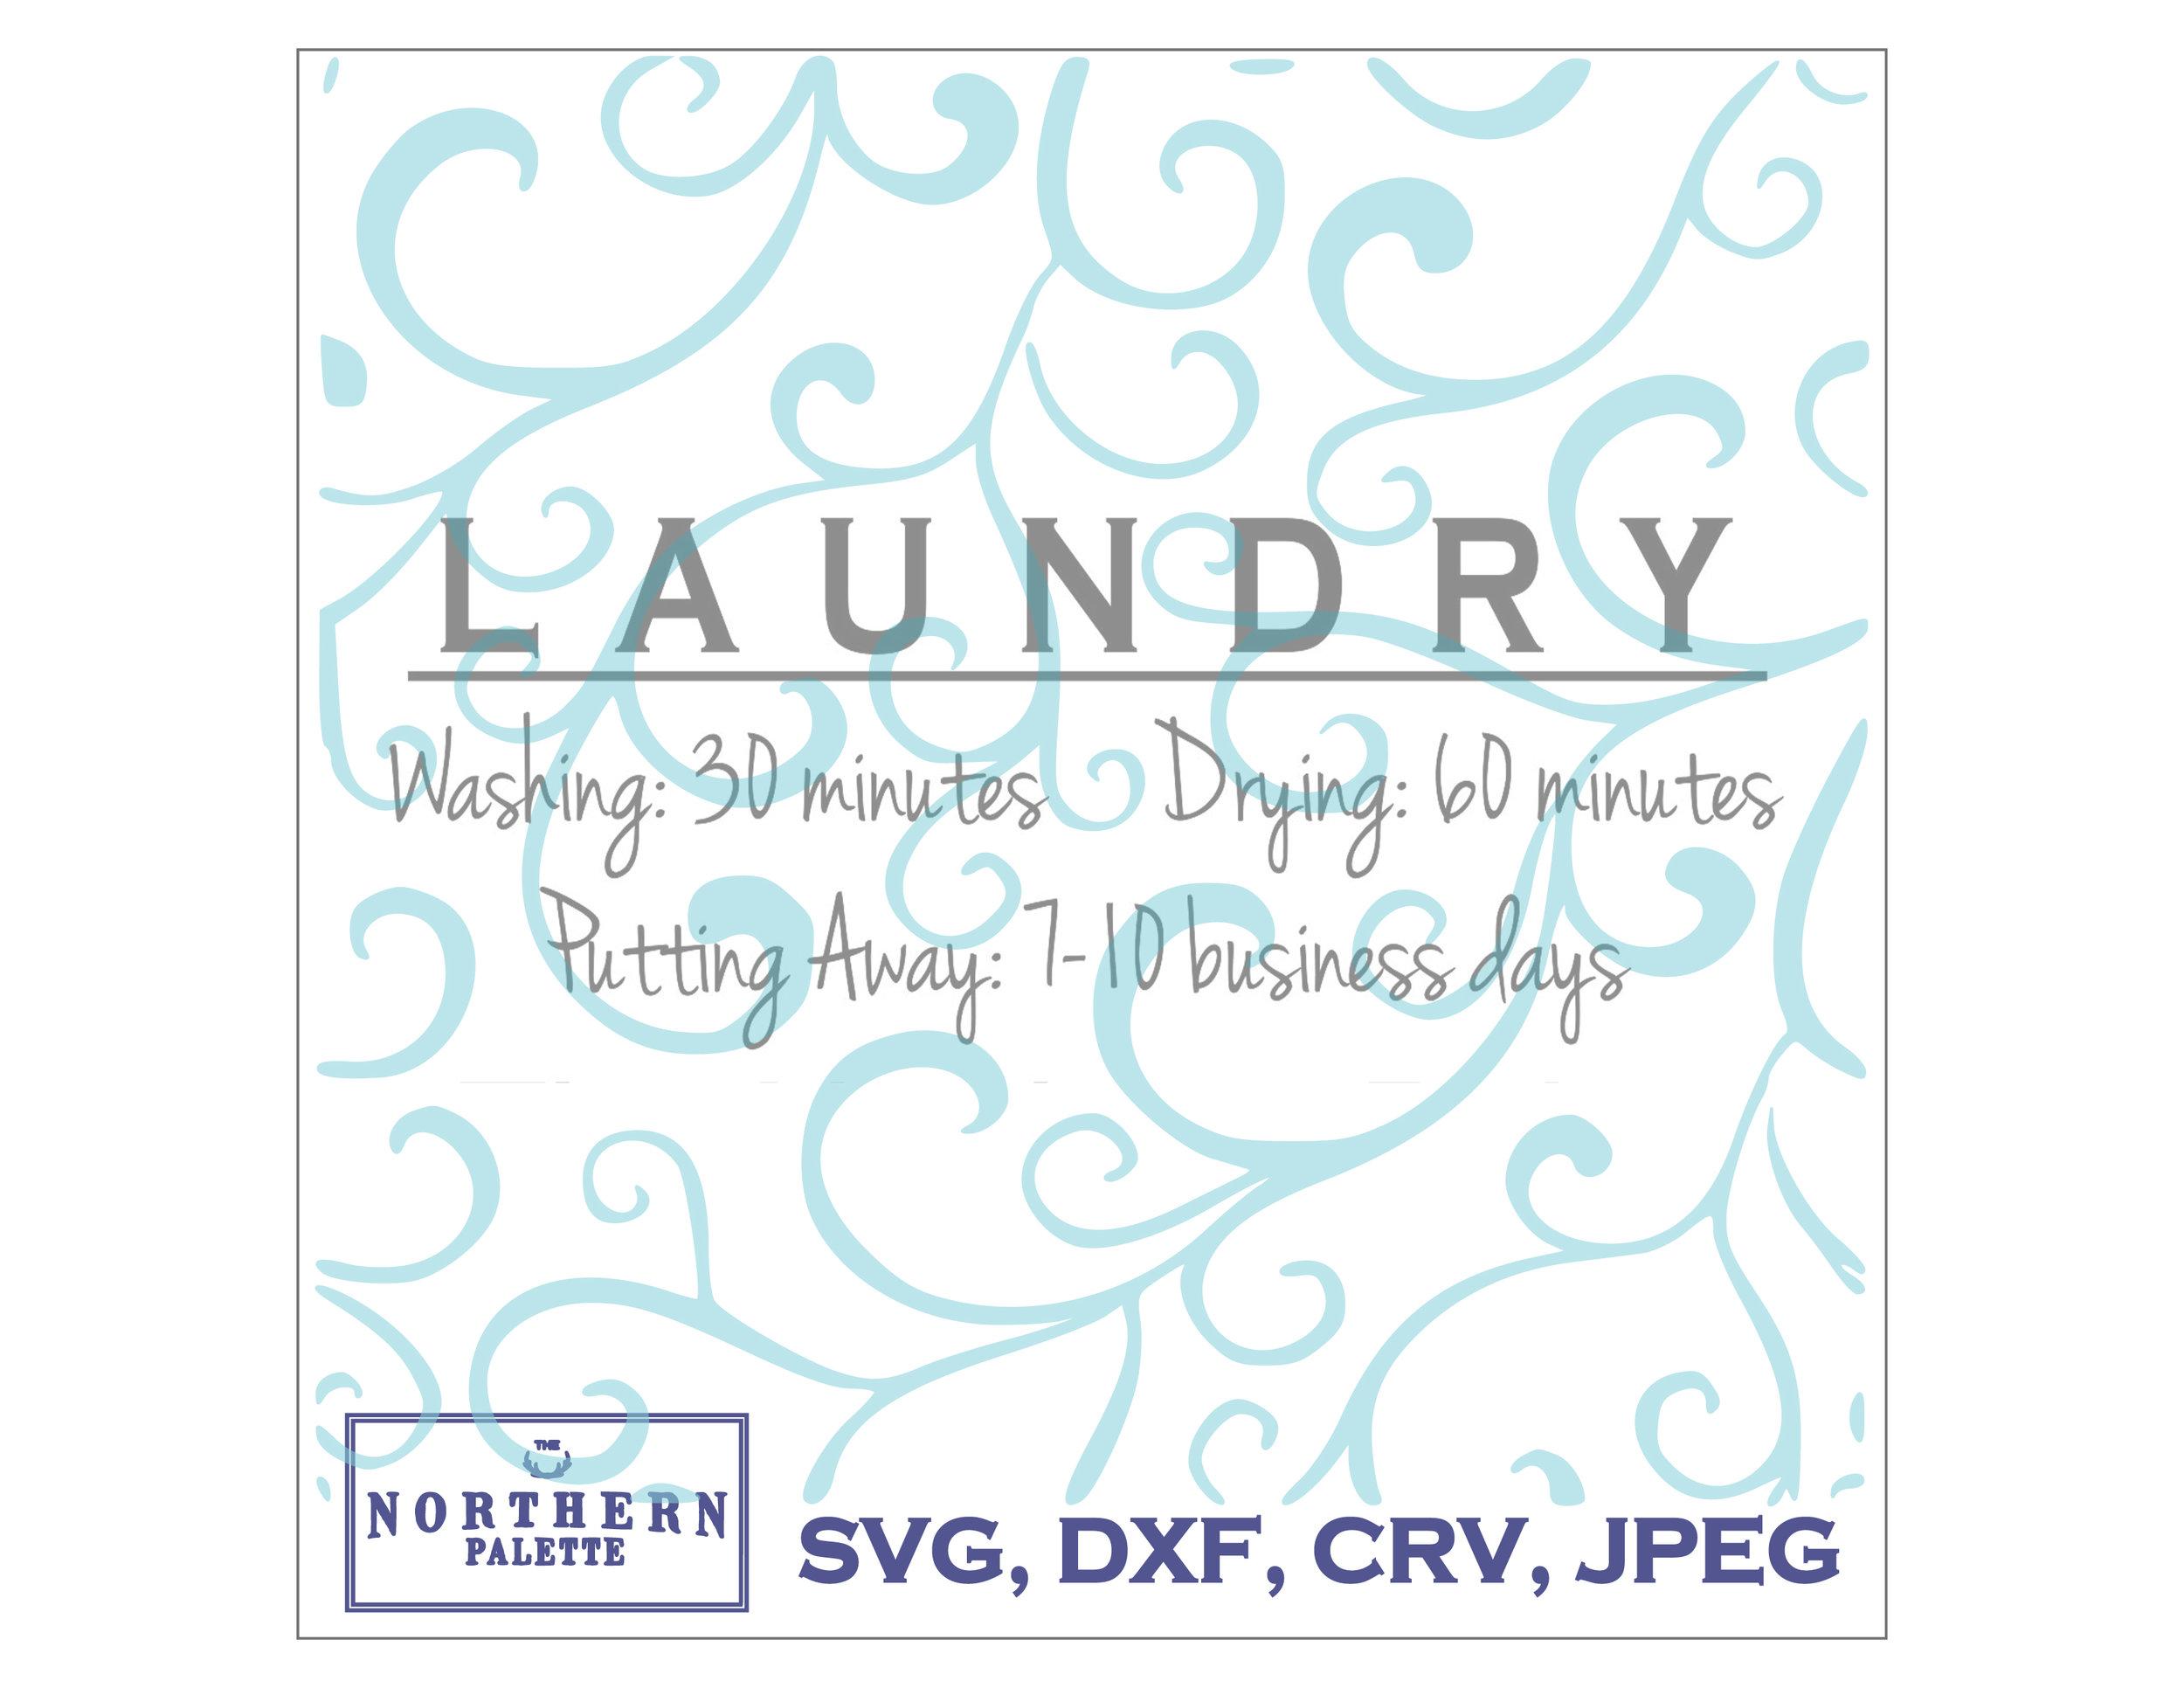 laundry wa.jpg